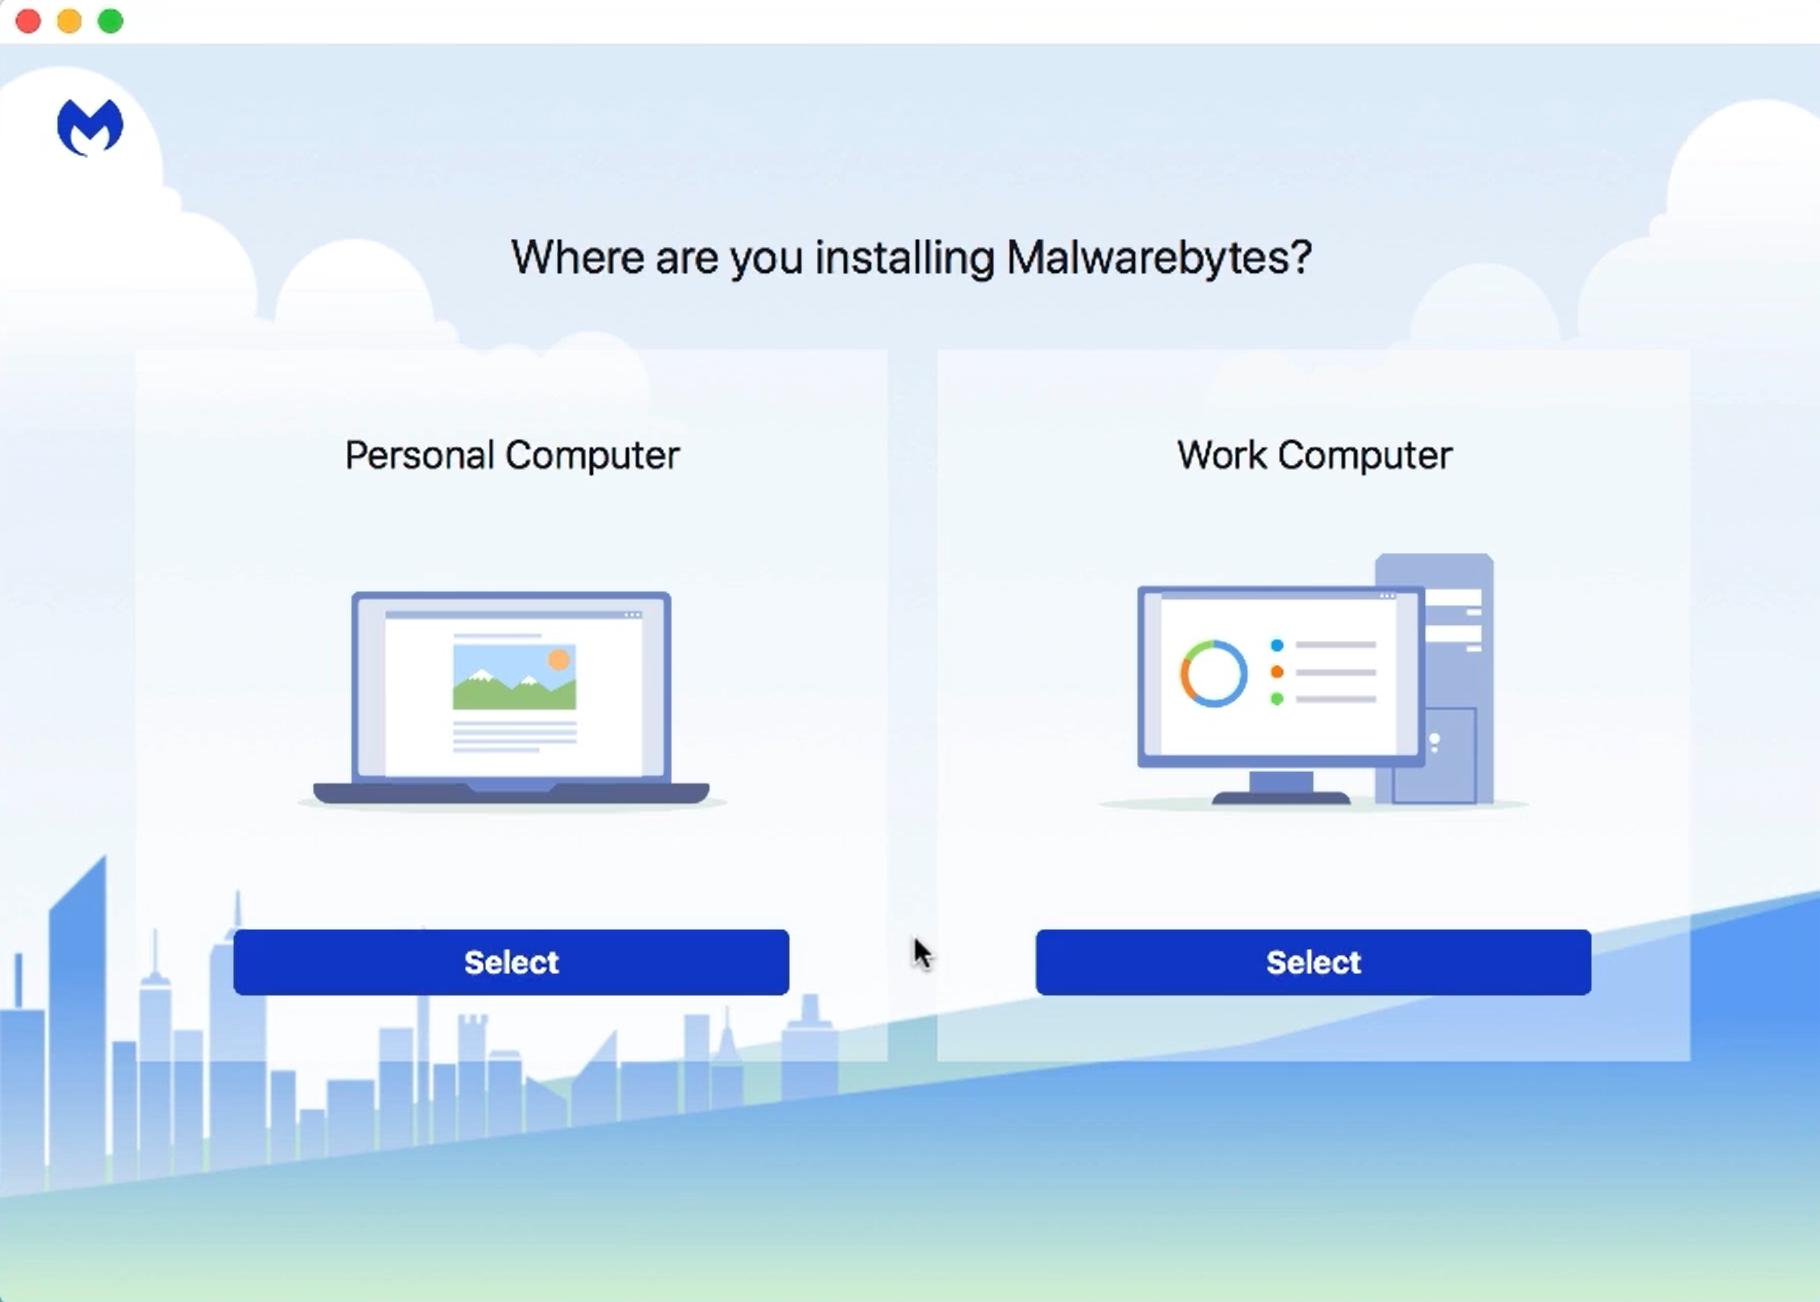 Install and Activate Malwarebytes for Windows v4 - start